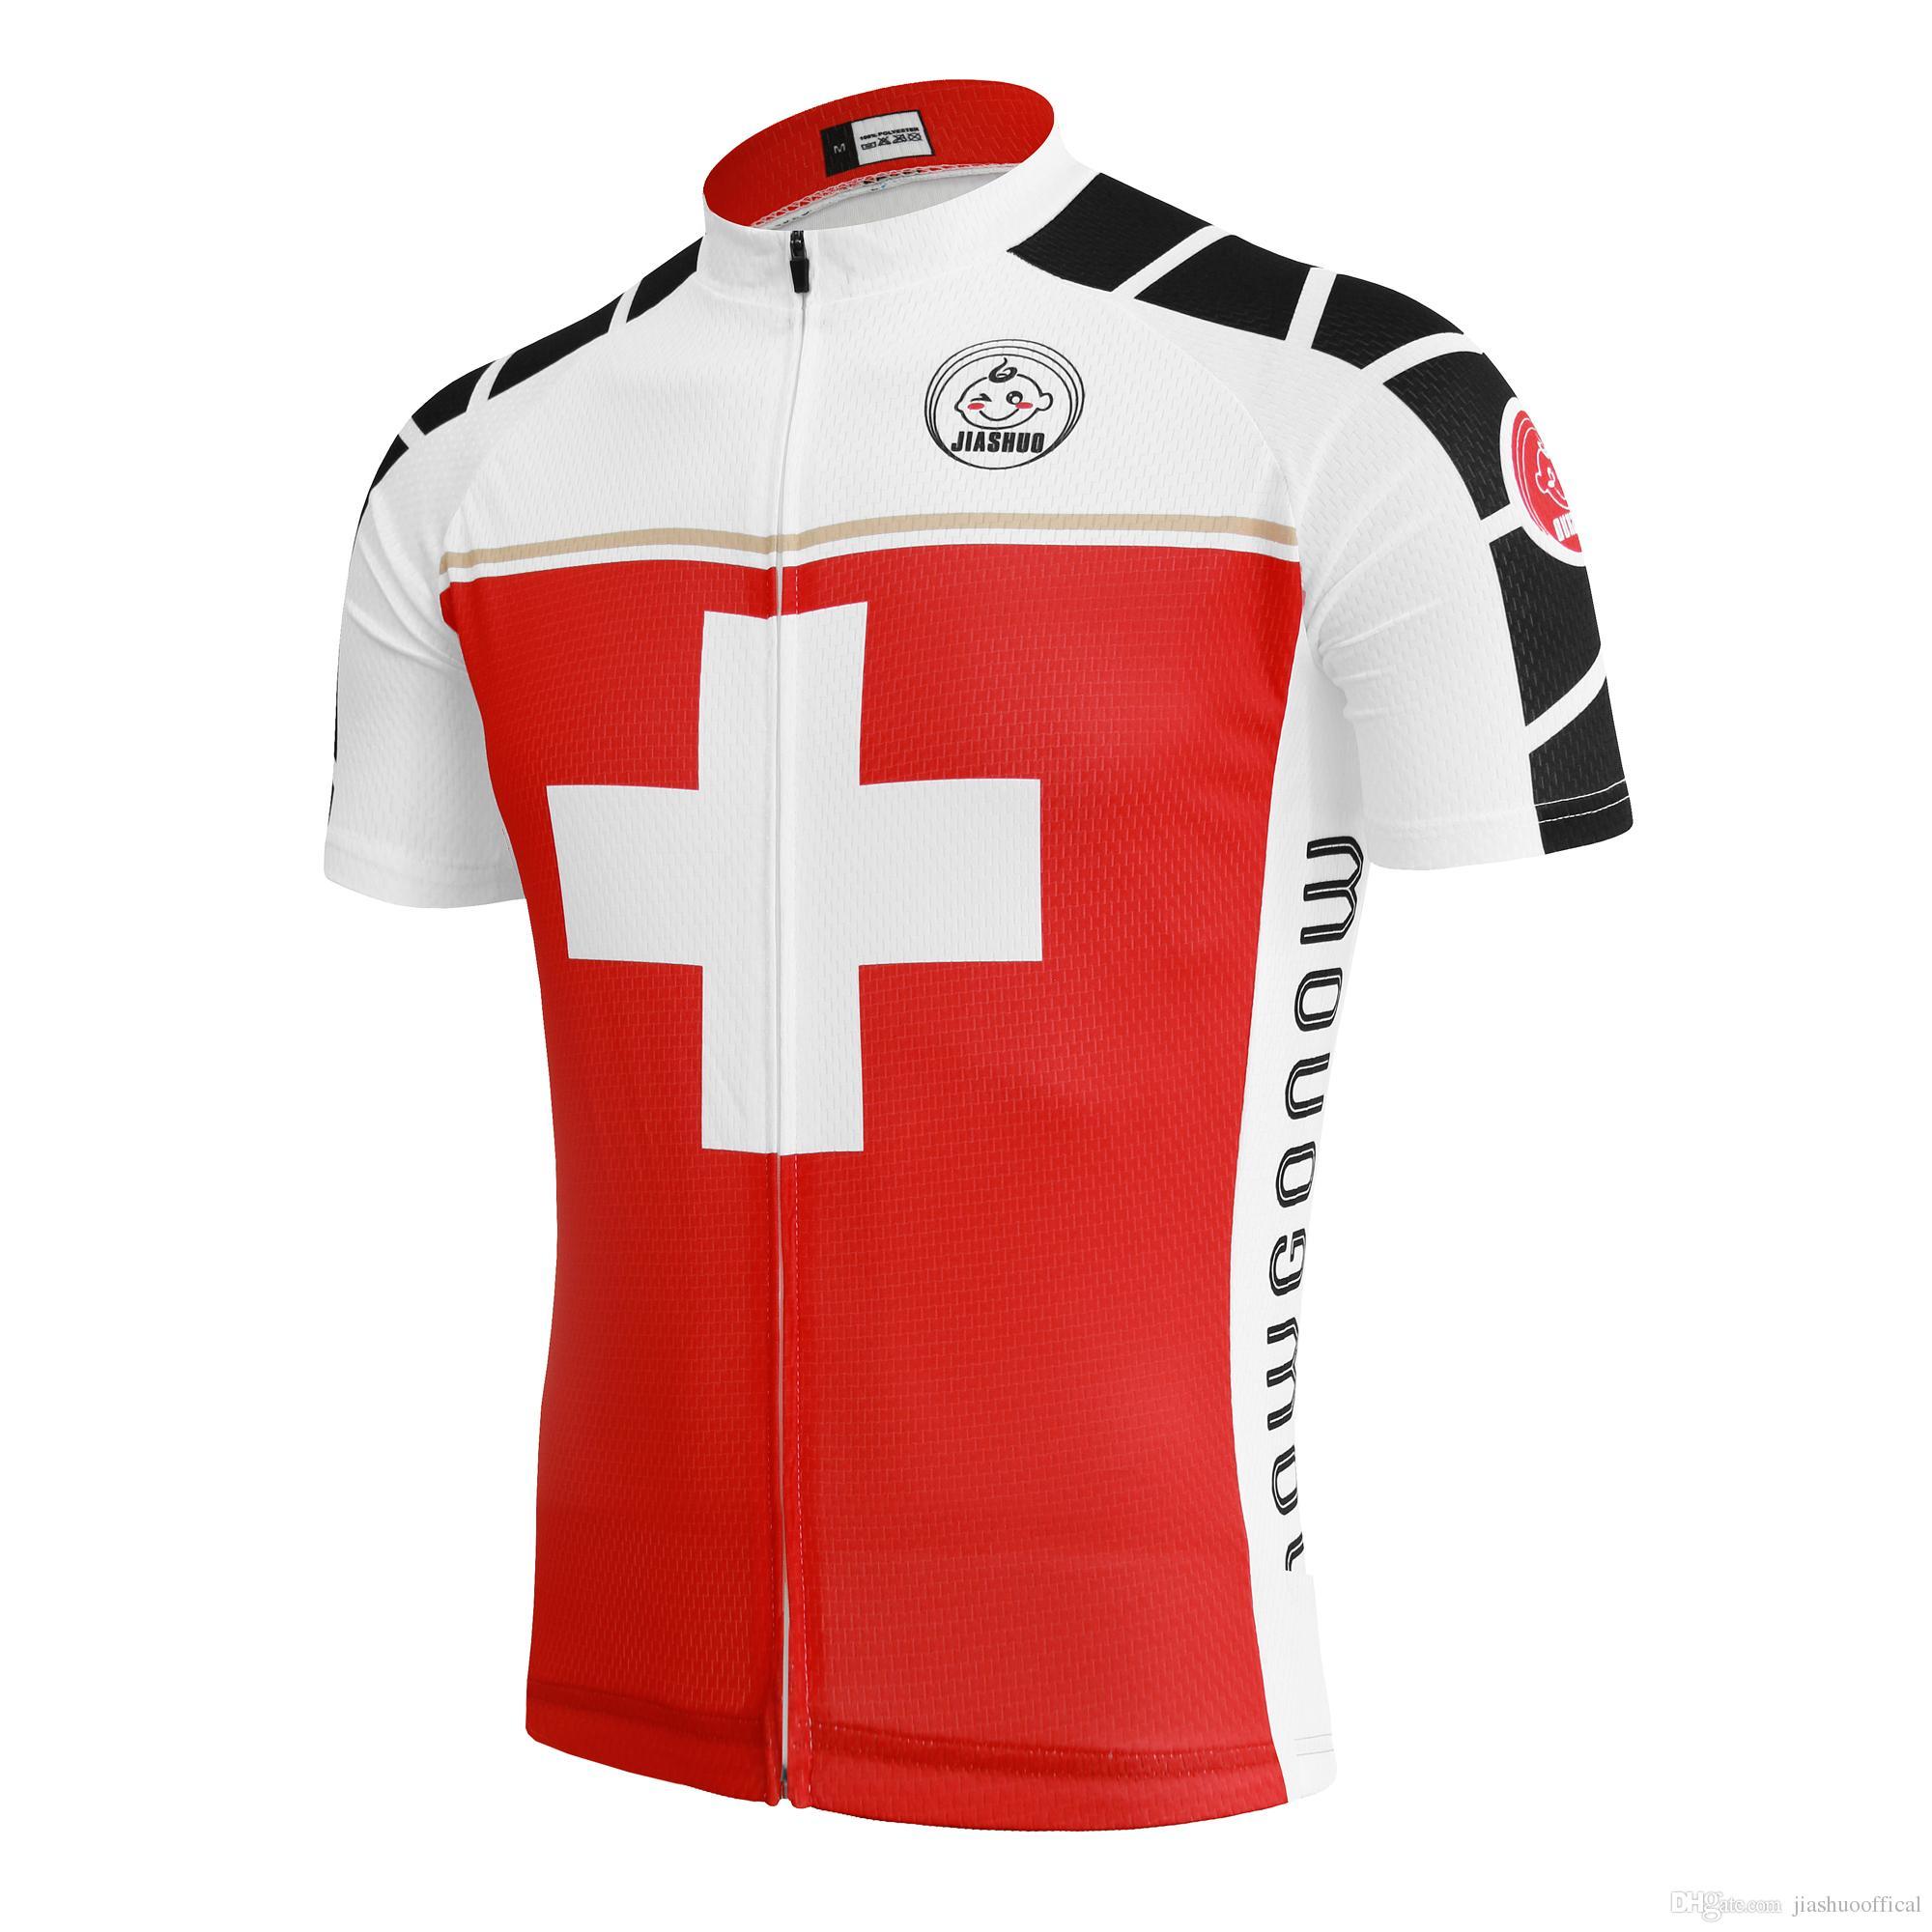 Customized NEW Hot 2017 CROSS RED JIASHUO Mtb Road RACING Team Bike Pro Cycling  Jersey   Shirts   Tops Clothing Breathing Air Online Shirts V Neck T Shirt  ... 3c45bd770